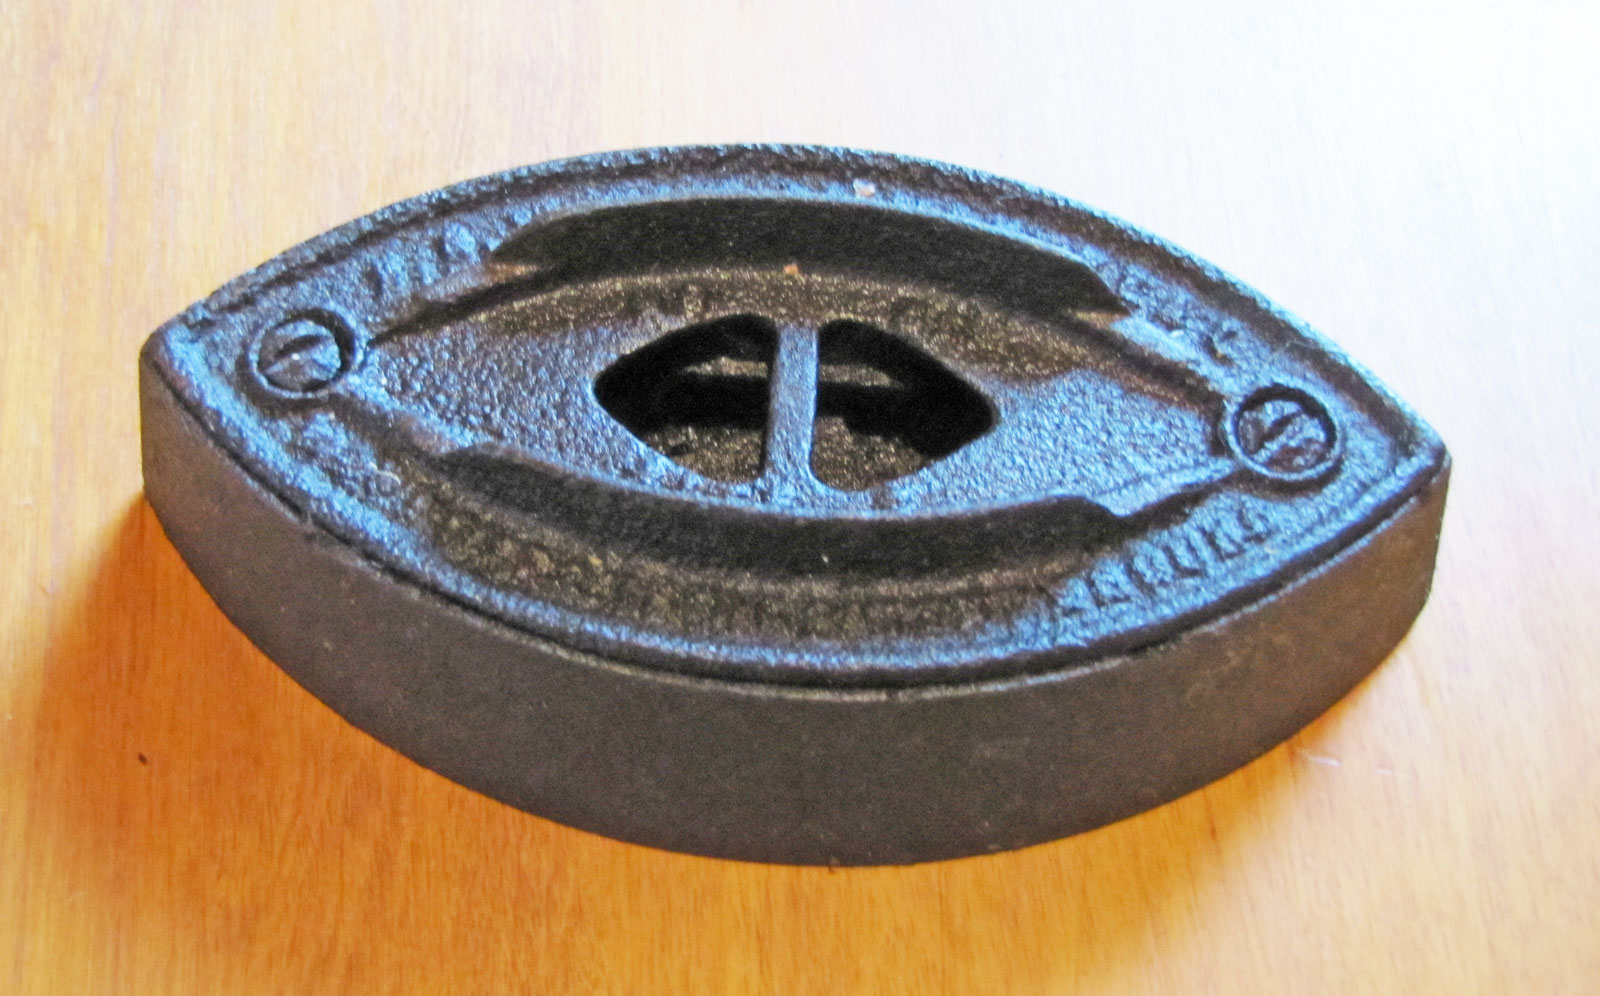 Sad Iron (no handle), Circa 1930